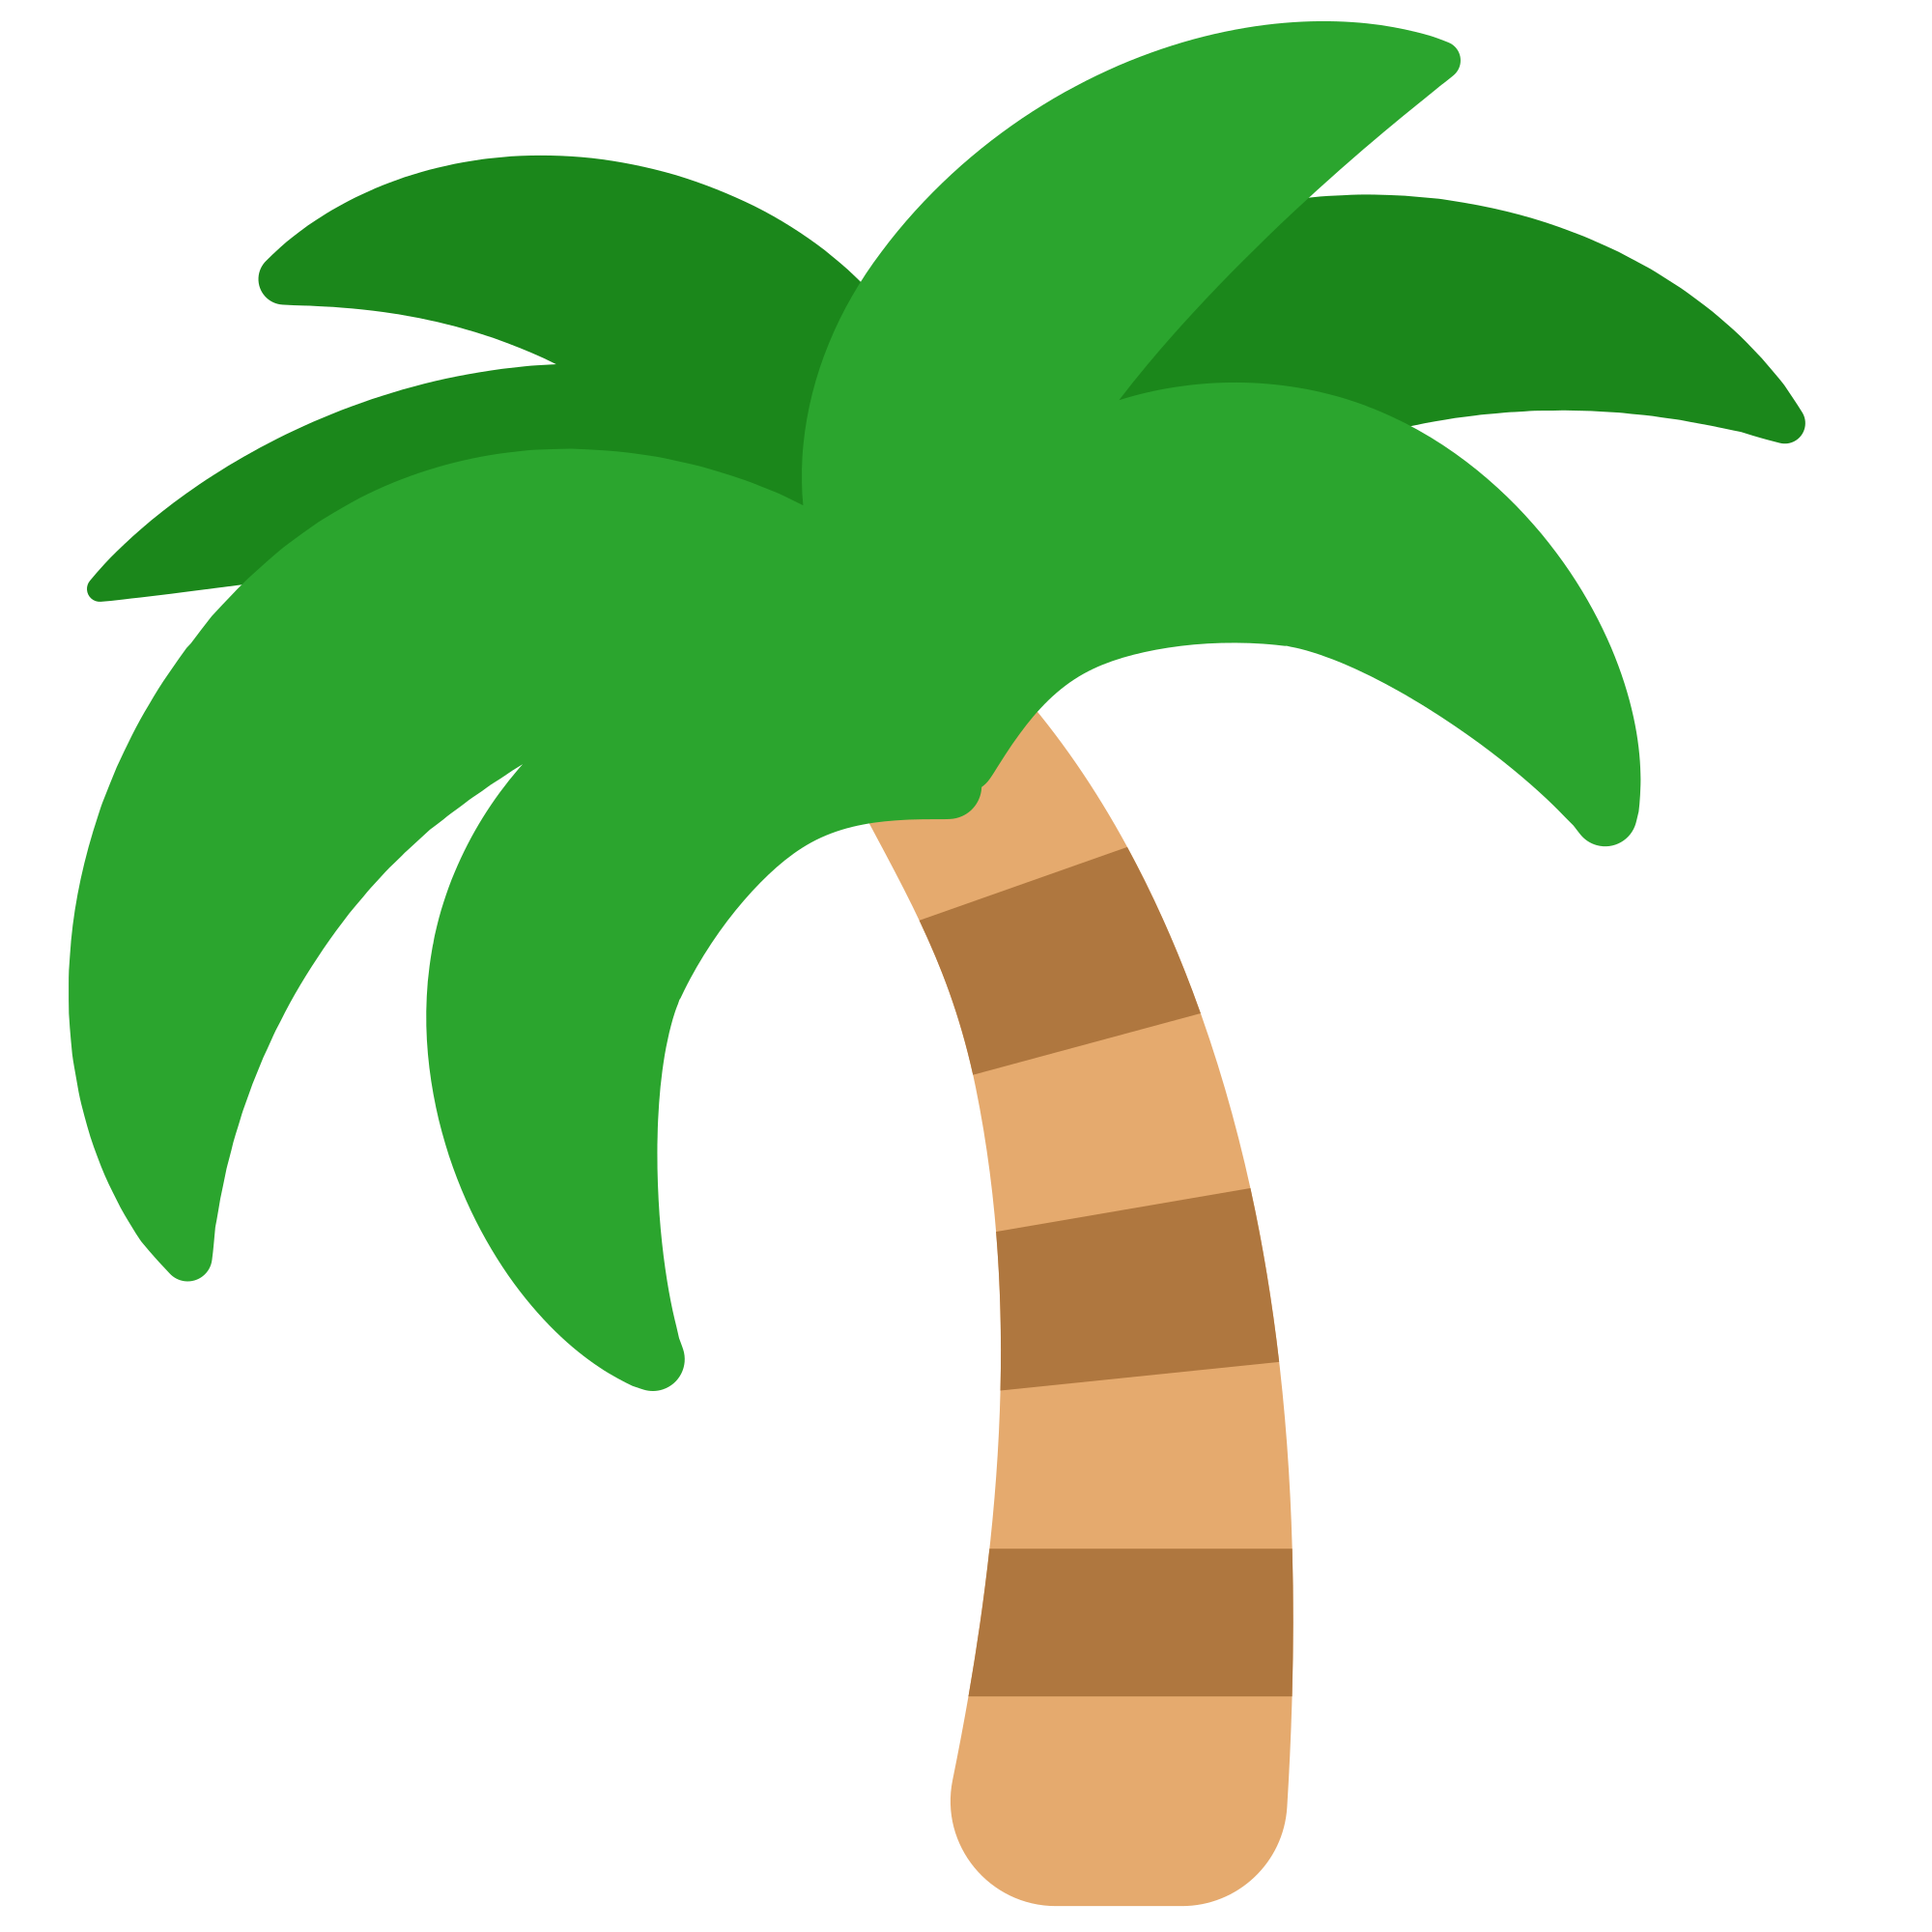 Sticker tree clip art. Emoji clipart leaf